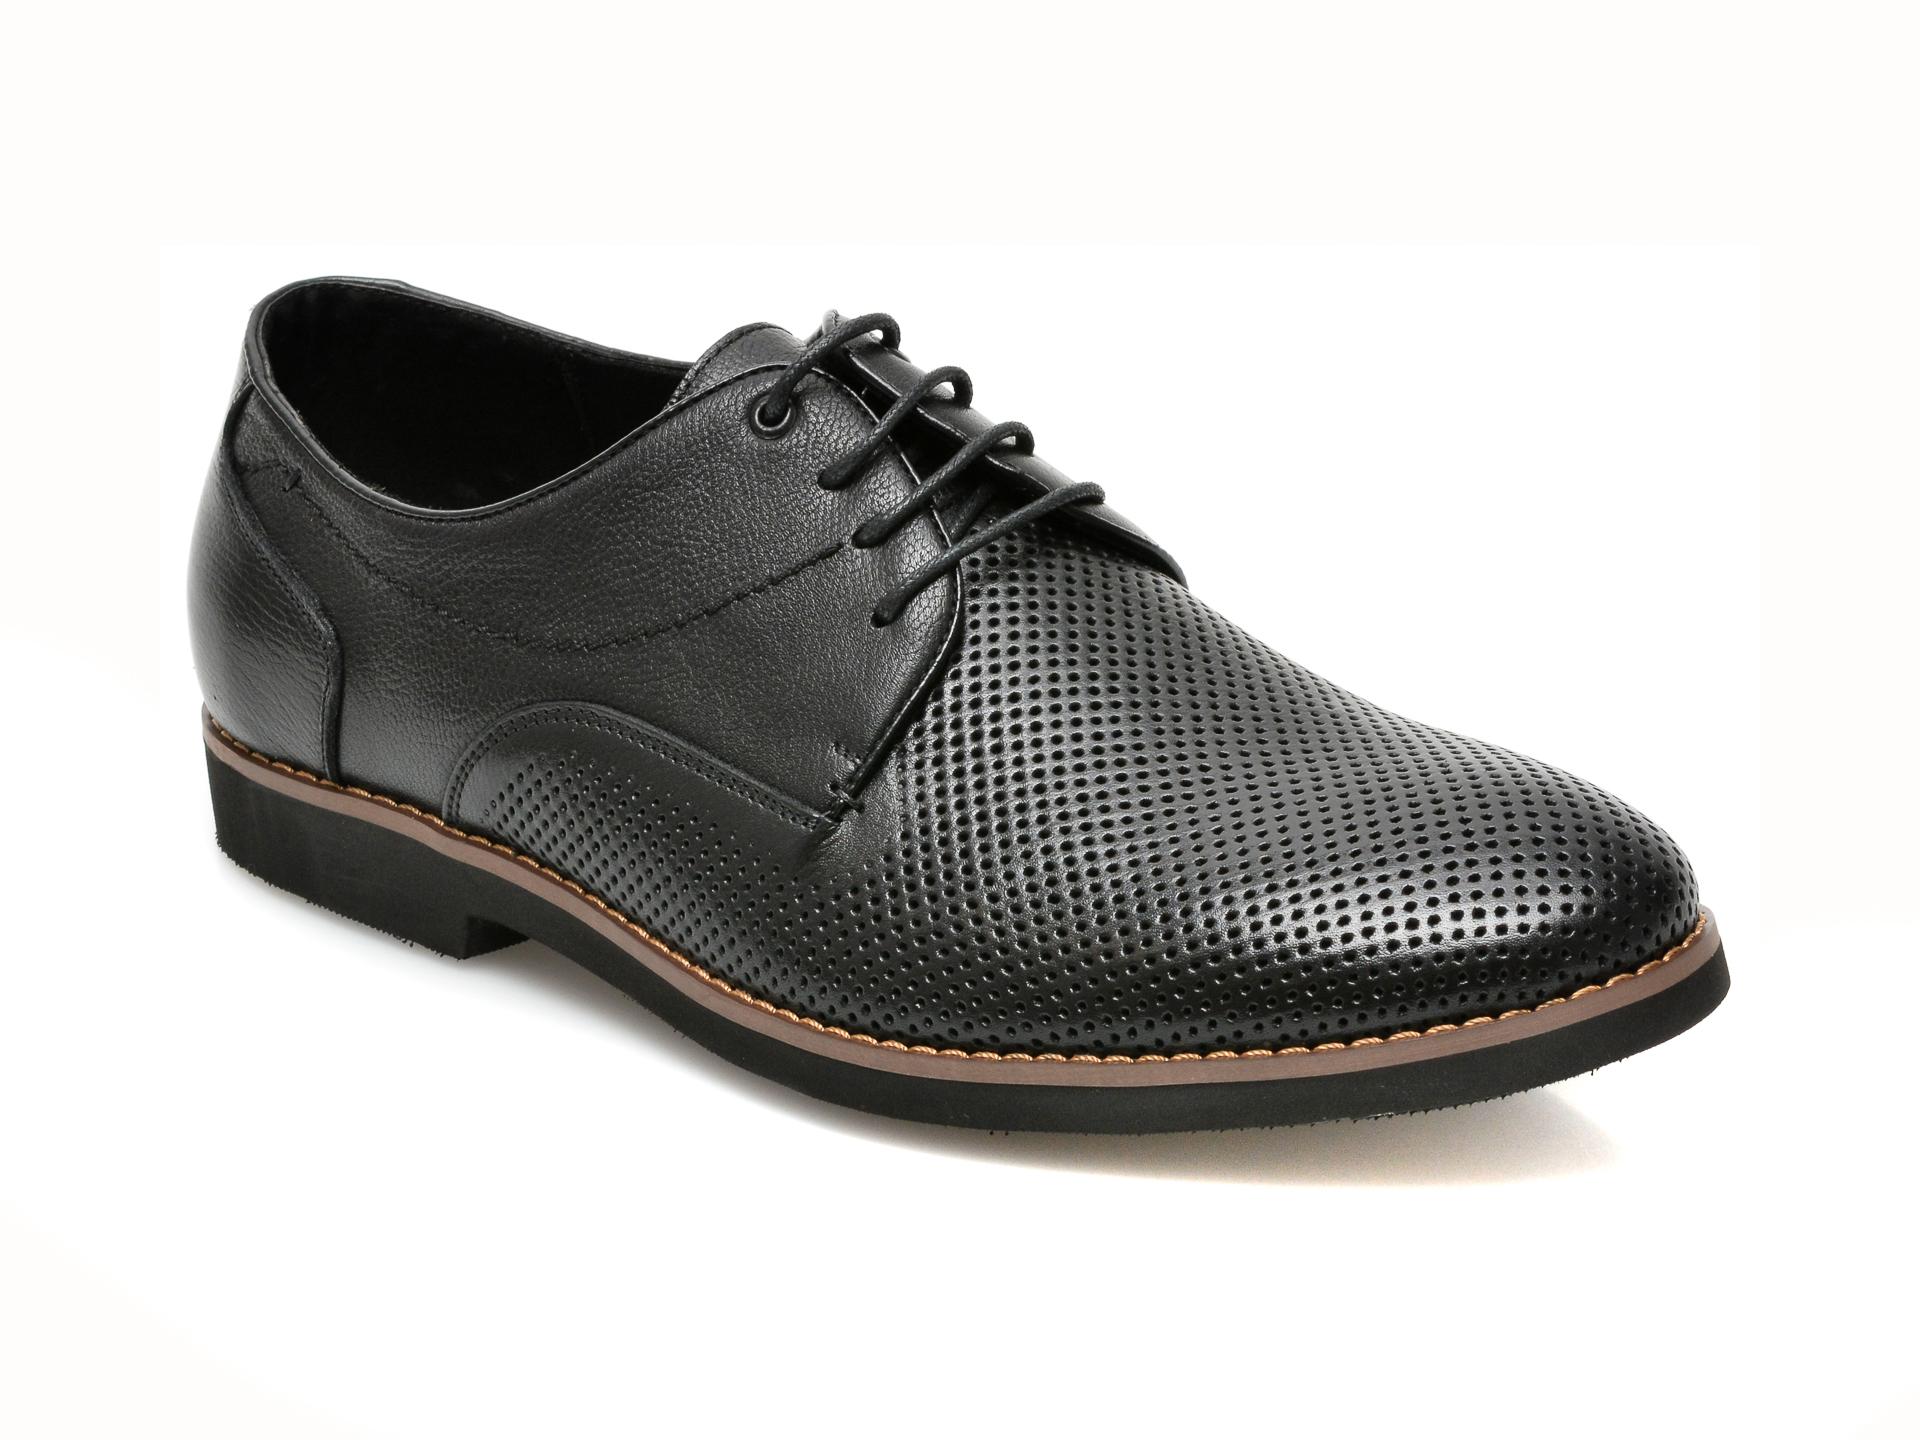 Pantofi OTTER negri, F40841, din piele naturala